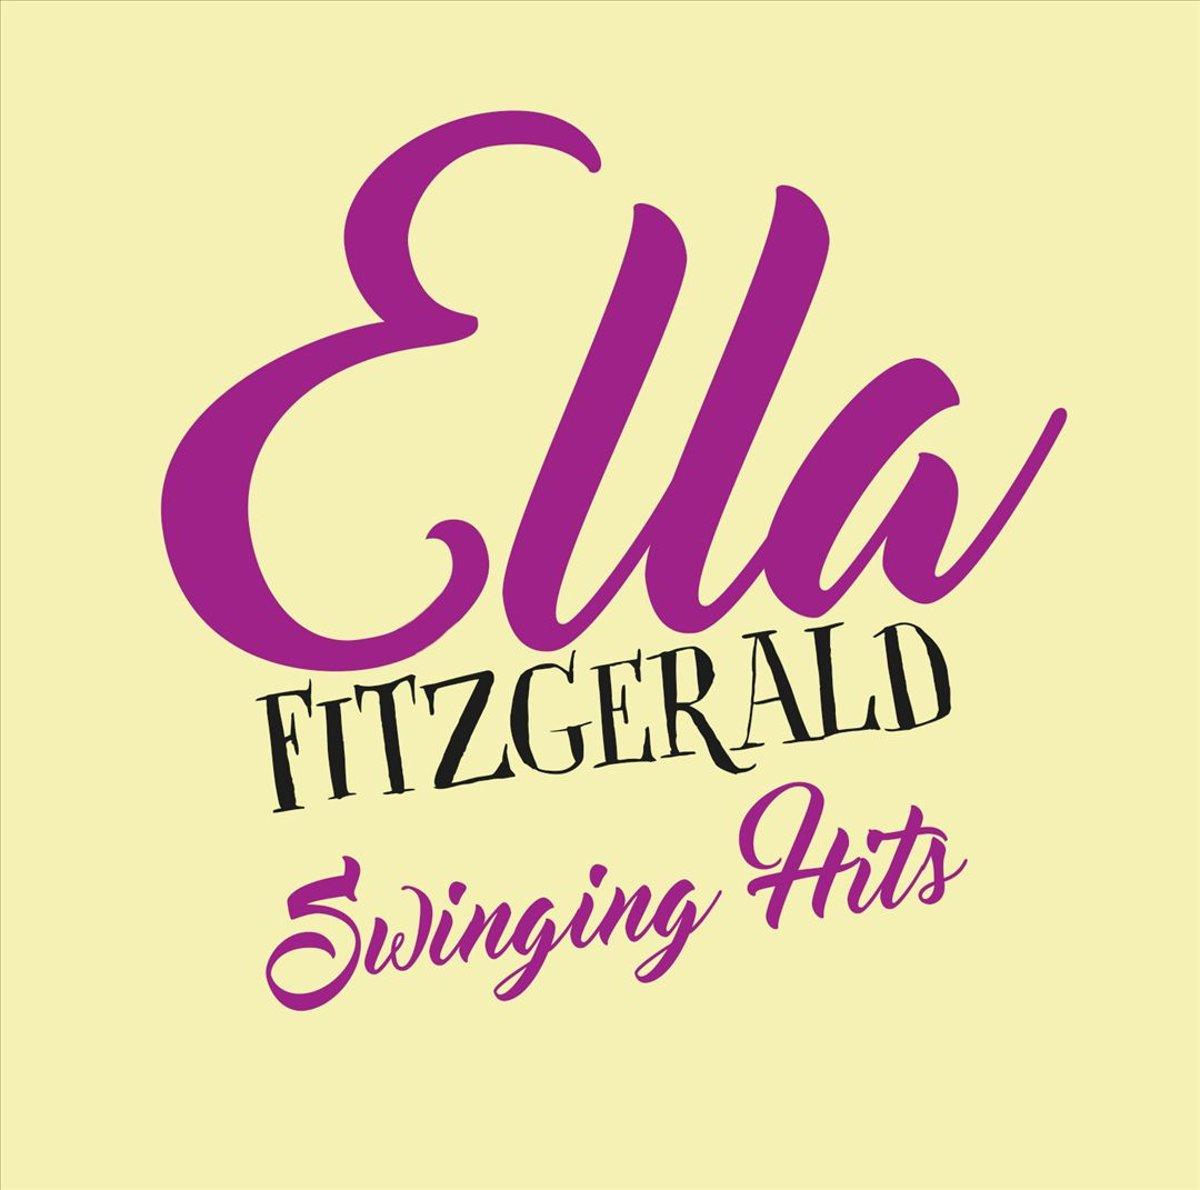 Элла Фитцжеральд Ella Fitzgerald. Swinging Hits (3 CD) cd ella fitzgerald great american songbook